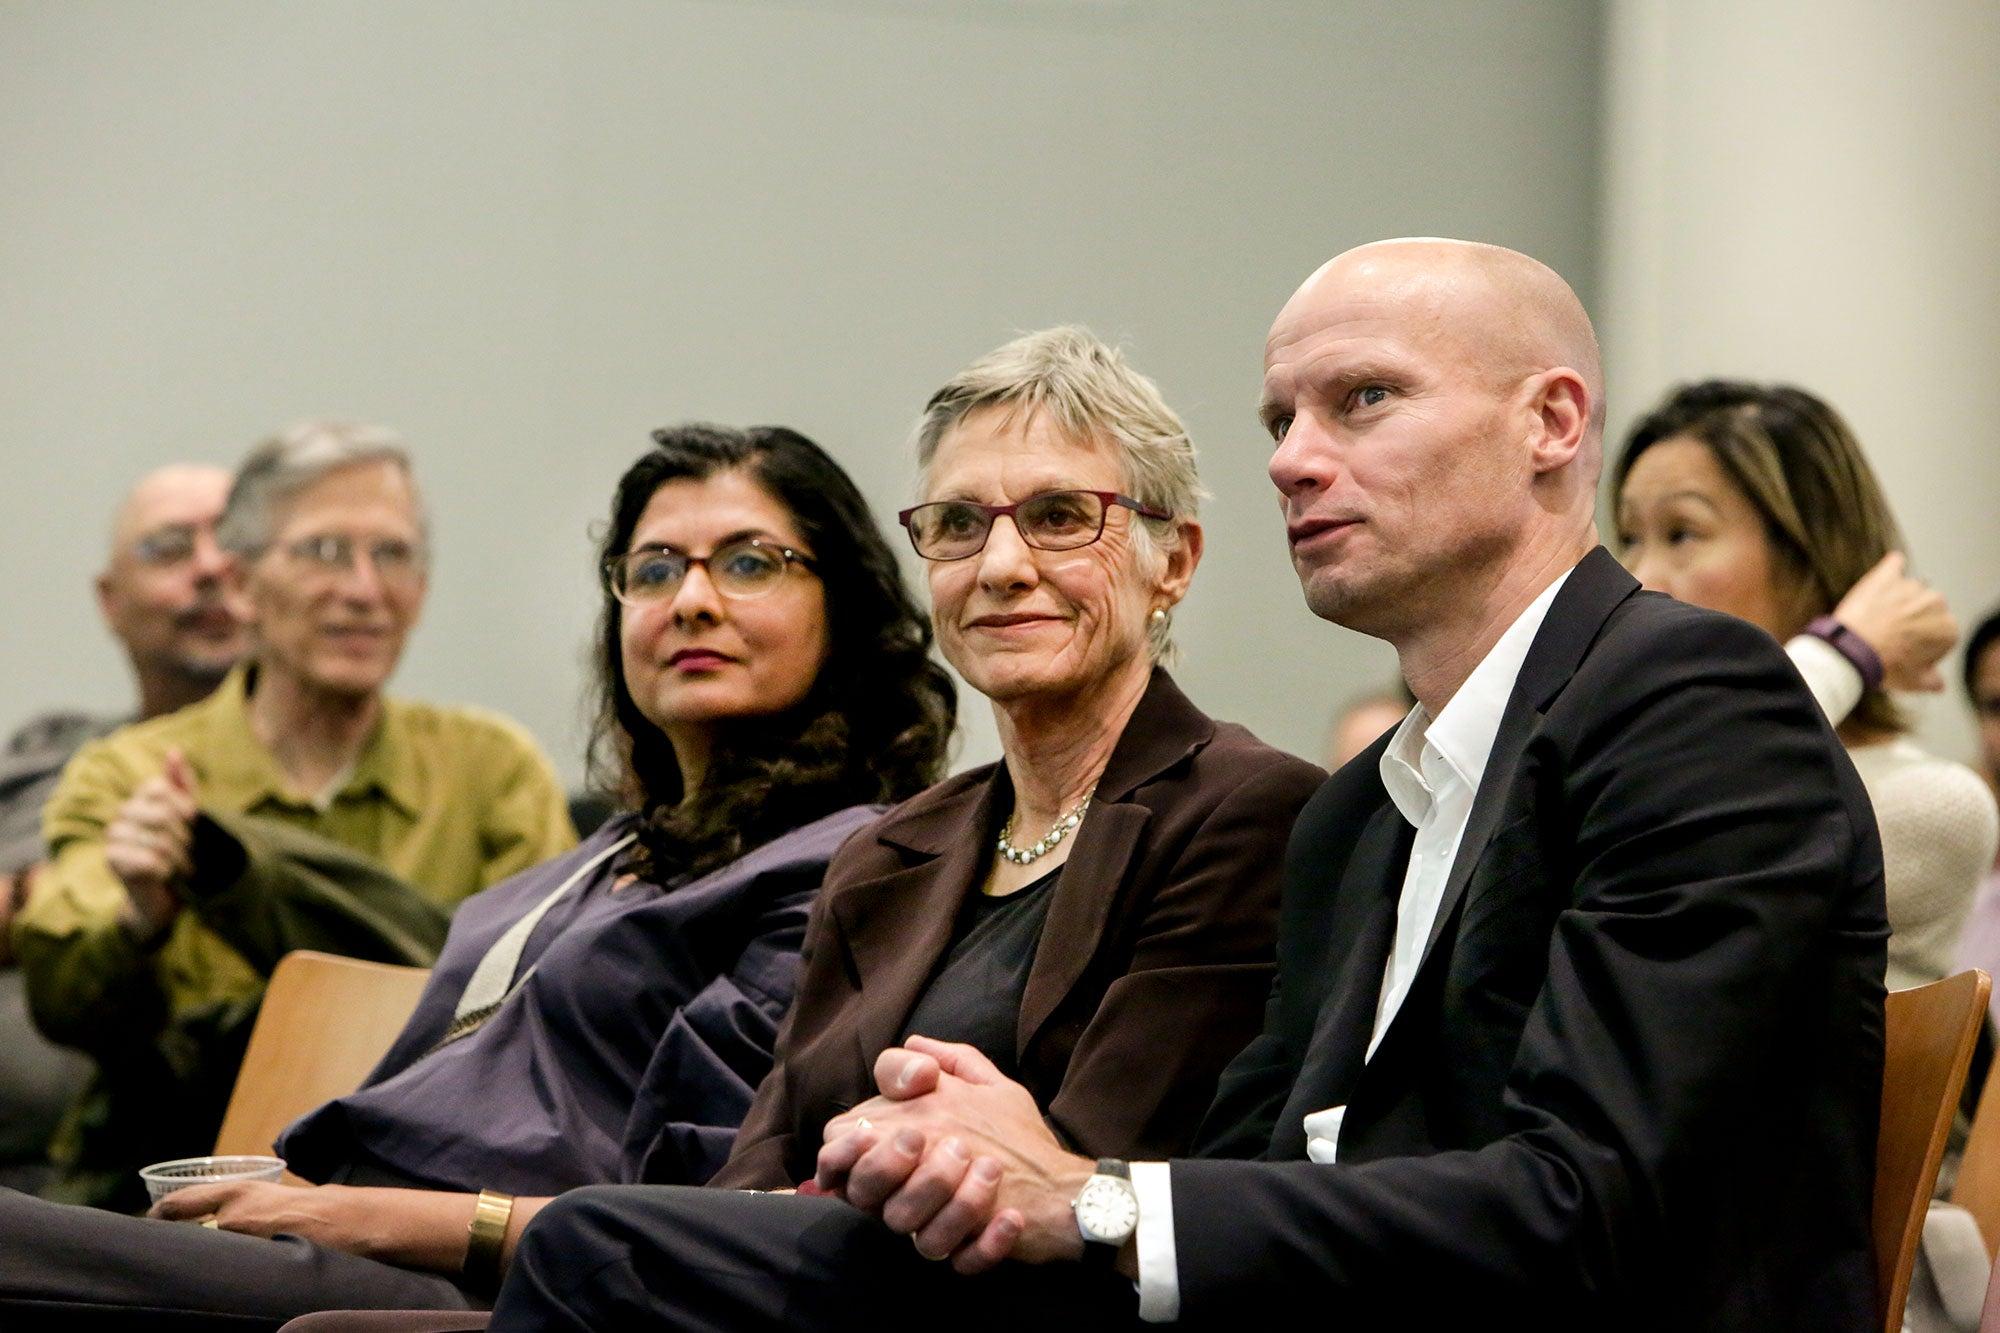 Rupal Sanghvi, Cathy Simon, Henk Ovink